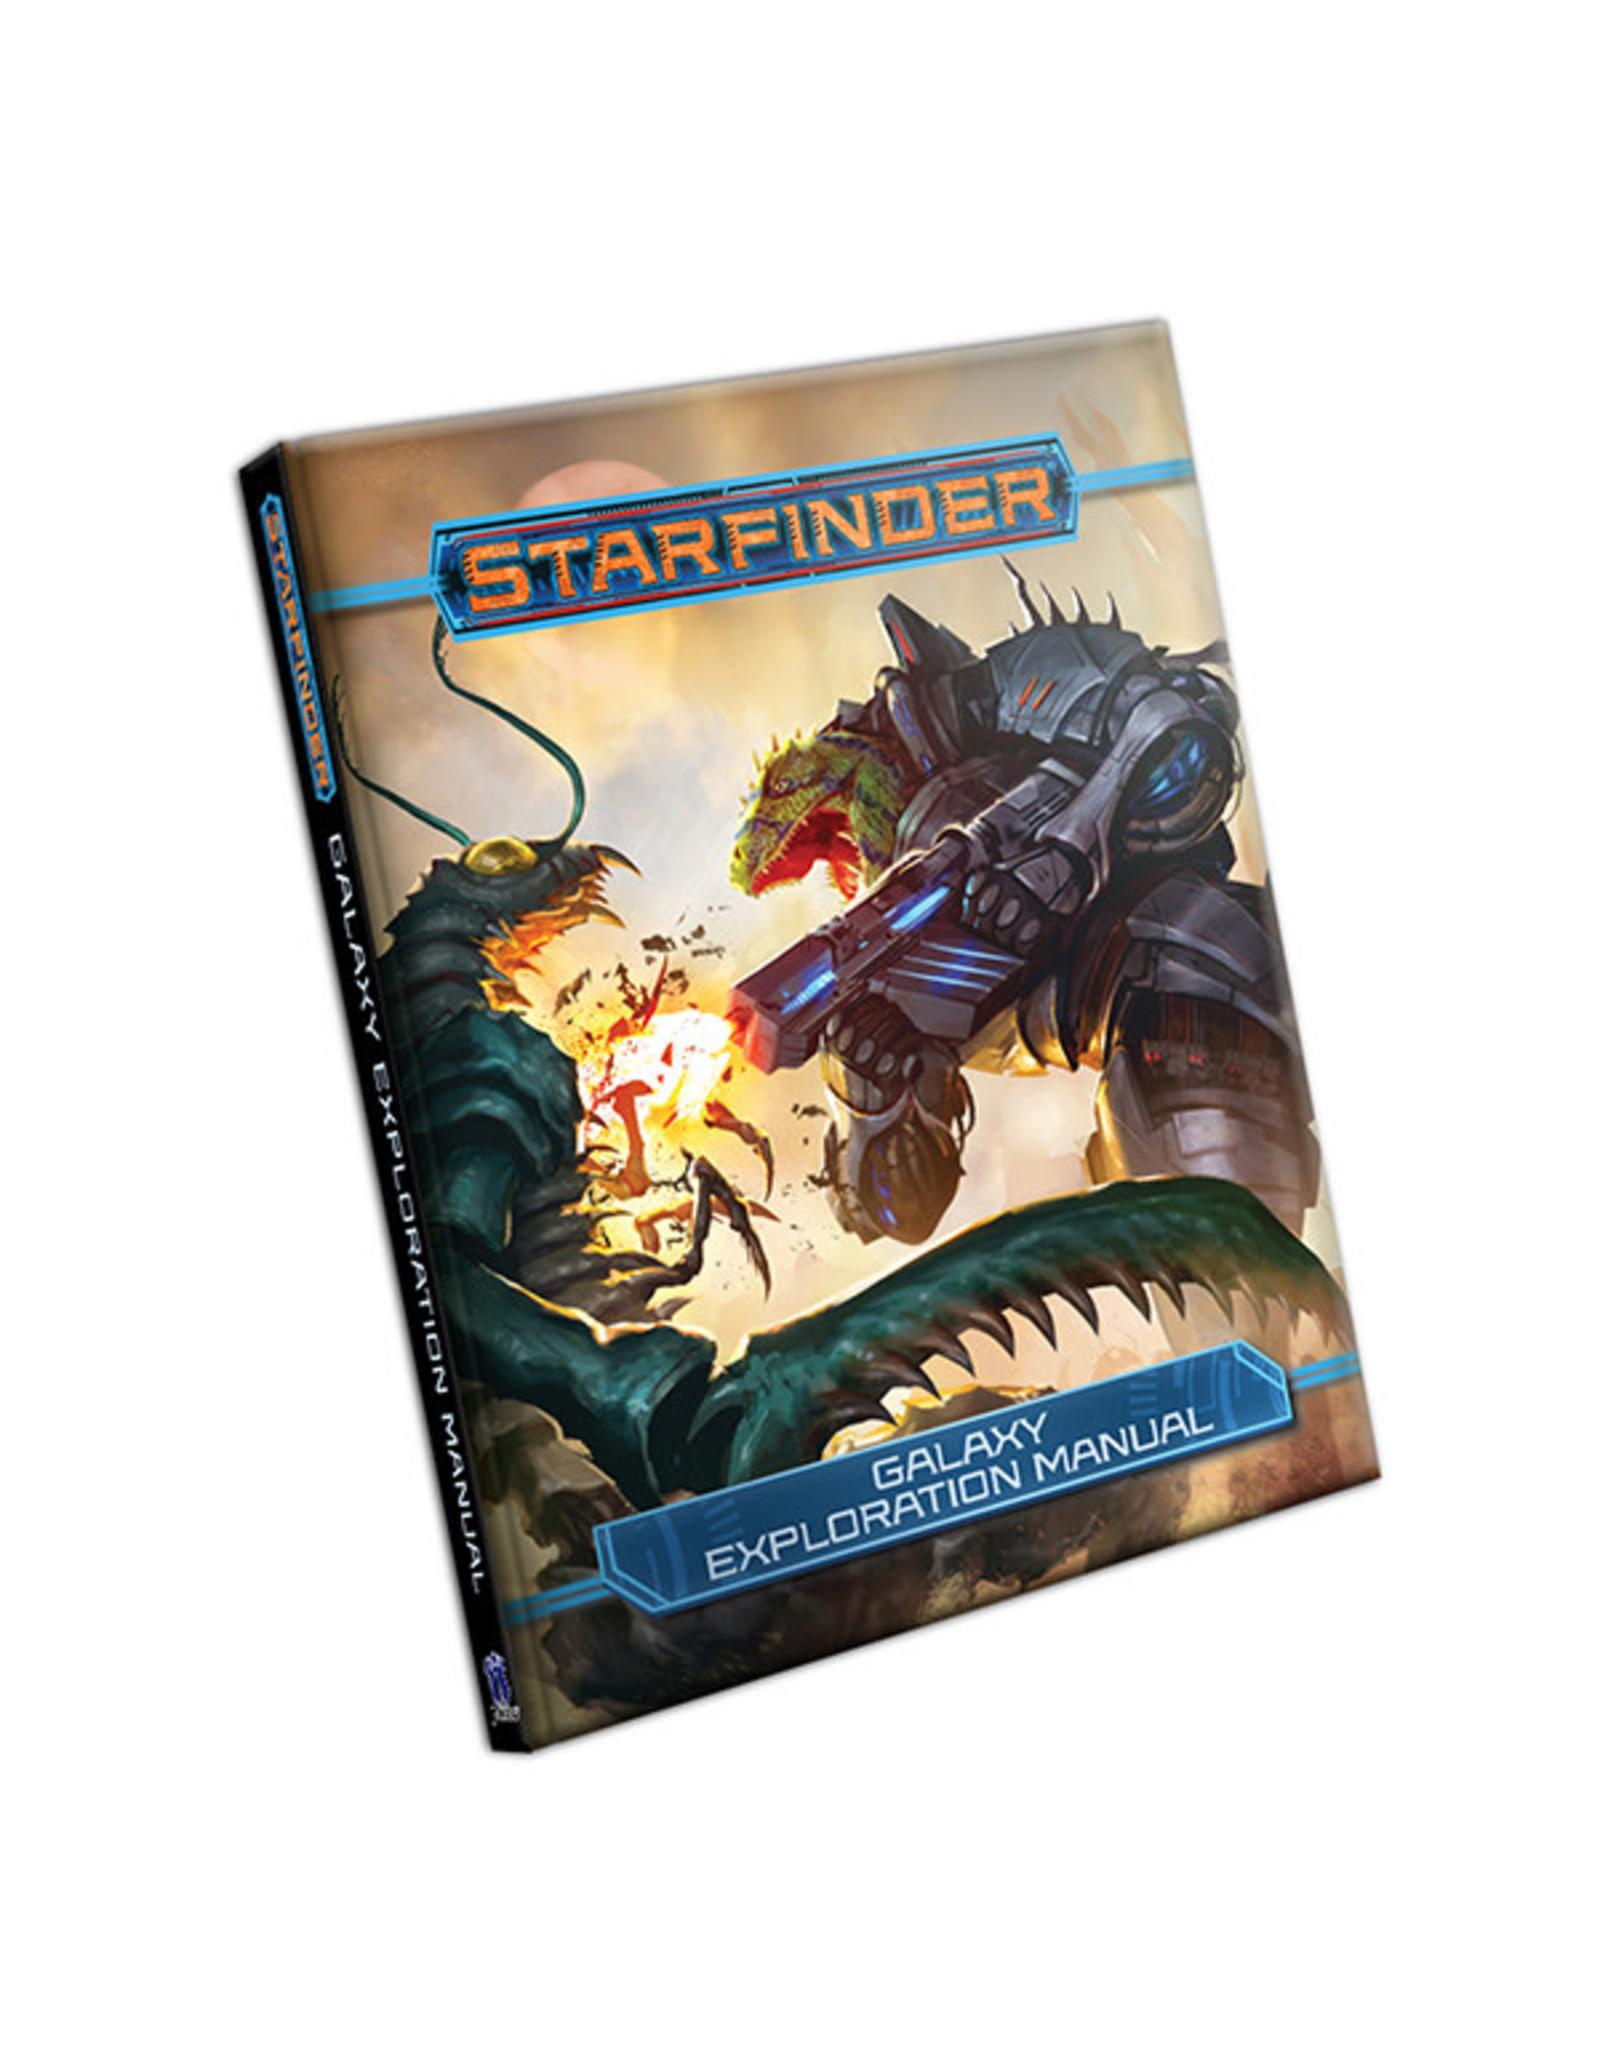 (Pre-Order) Starfinder RPG: Galaxy Exploration Manual